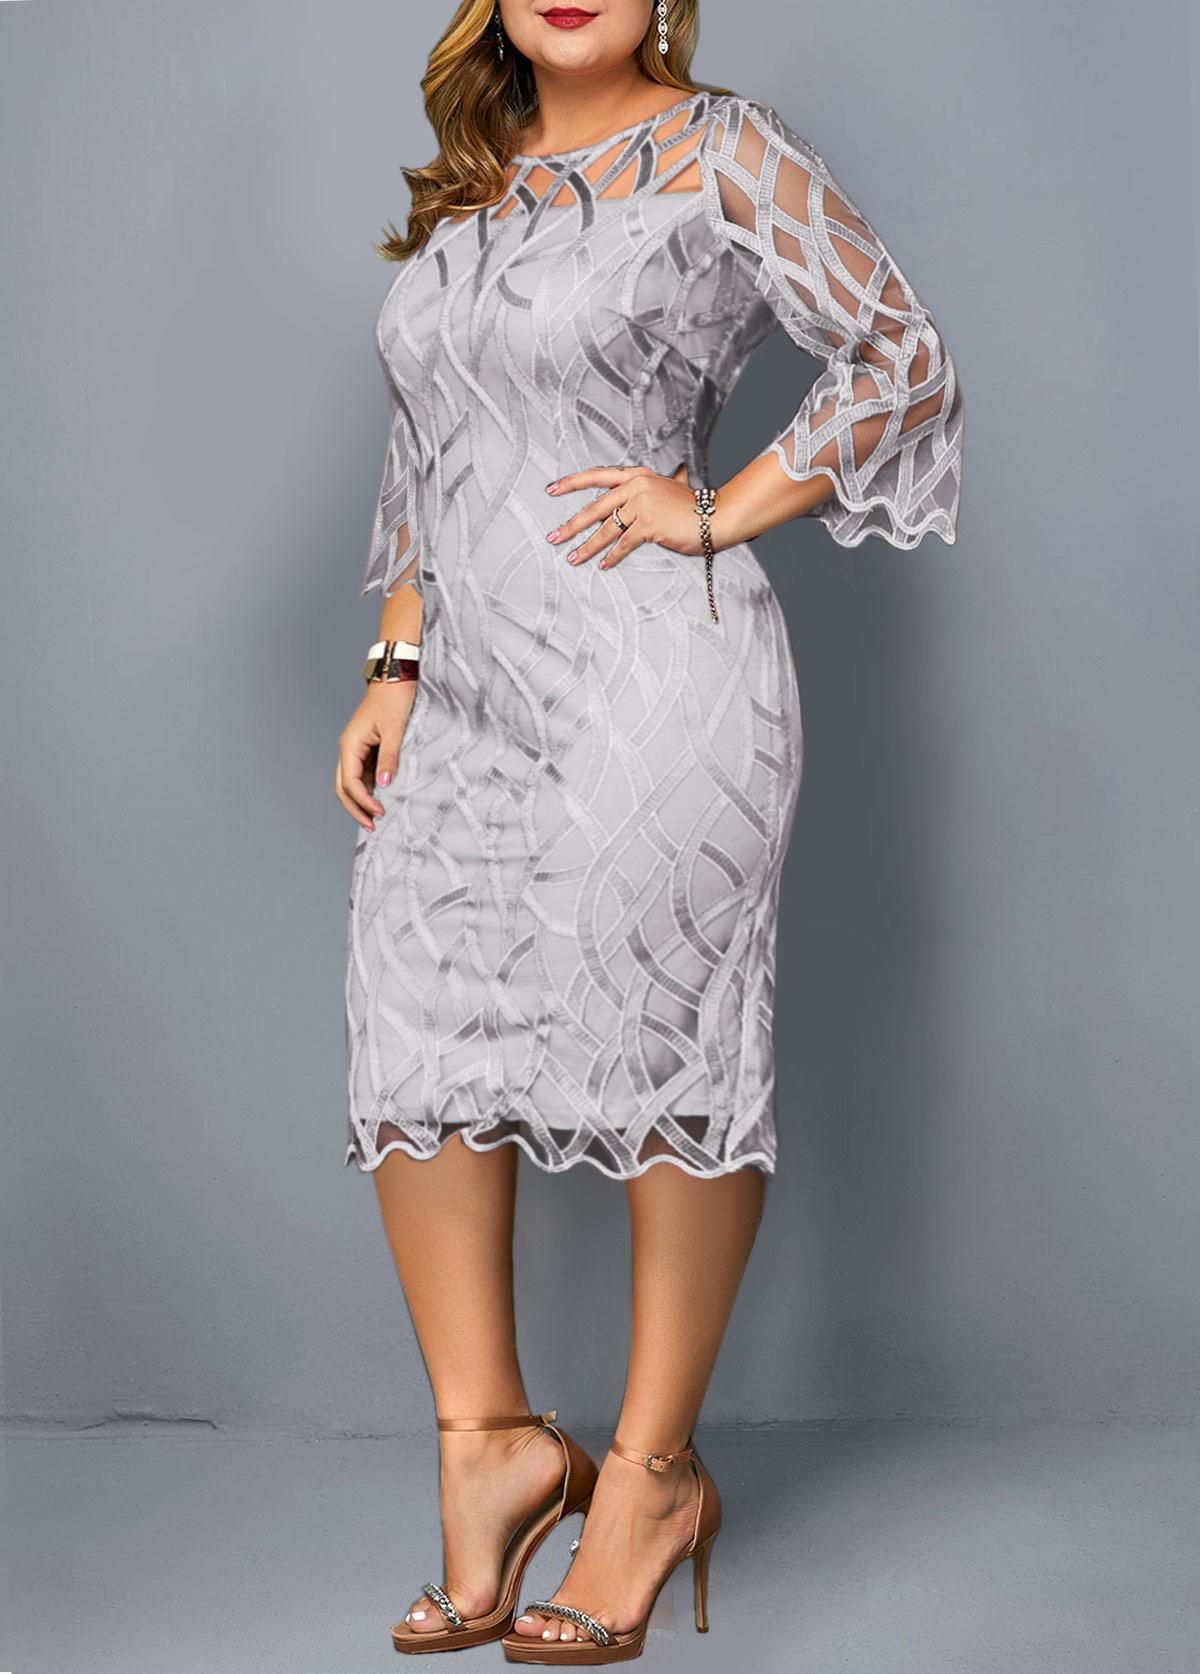 Plus Size Round Neck 3/4 Sleeve Dress